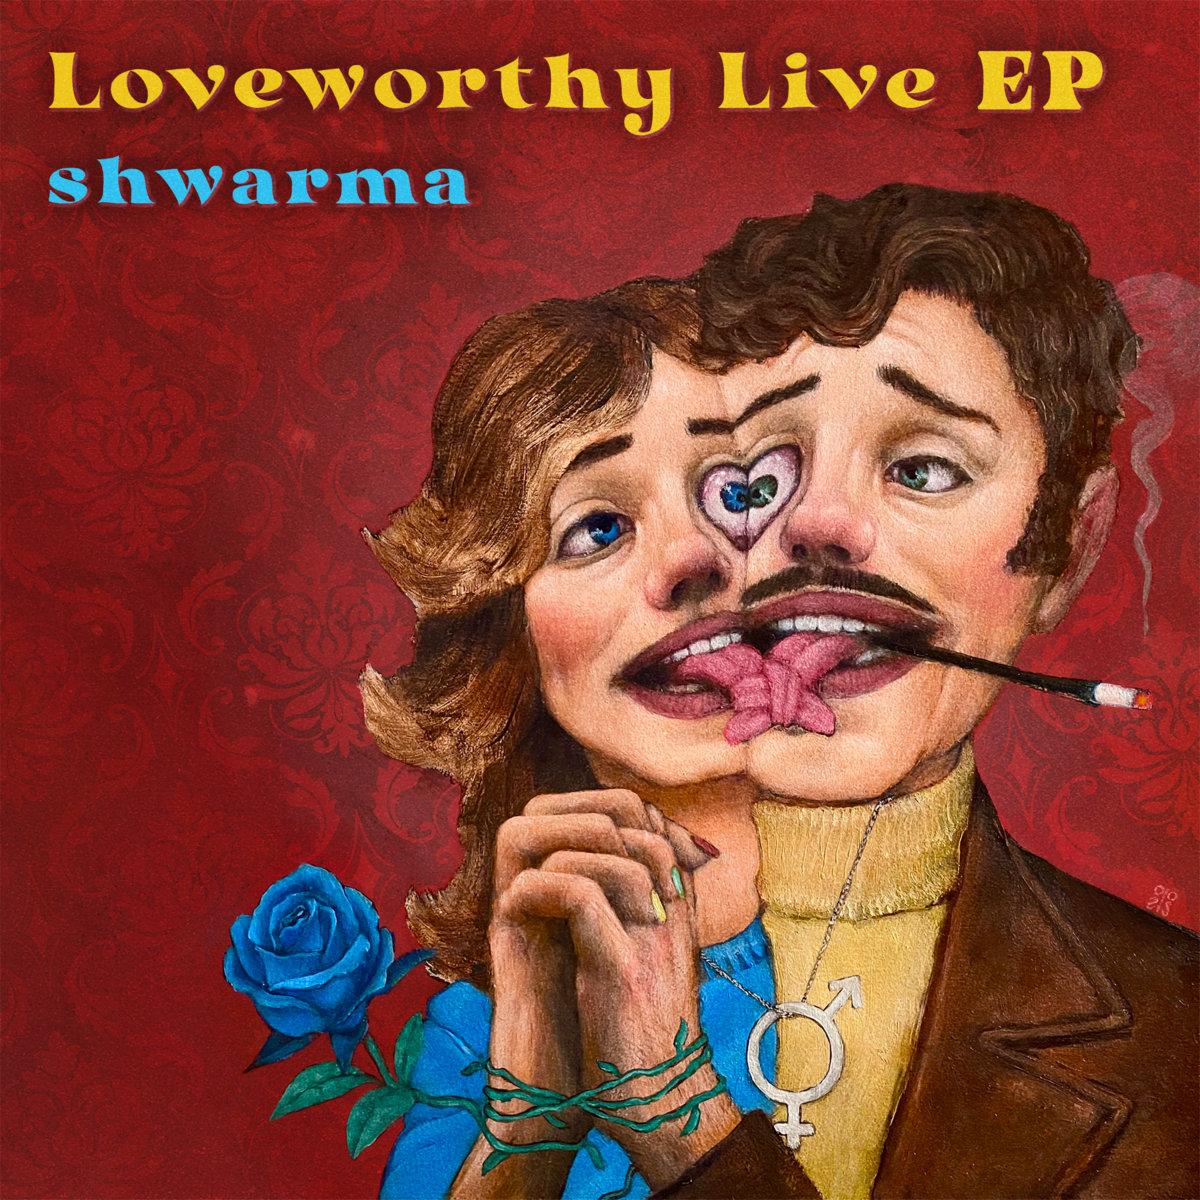 Loveworthy Live EP album cover